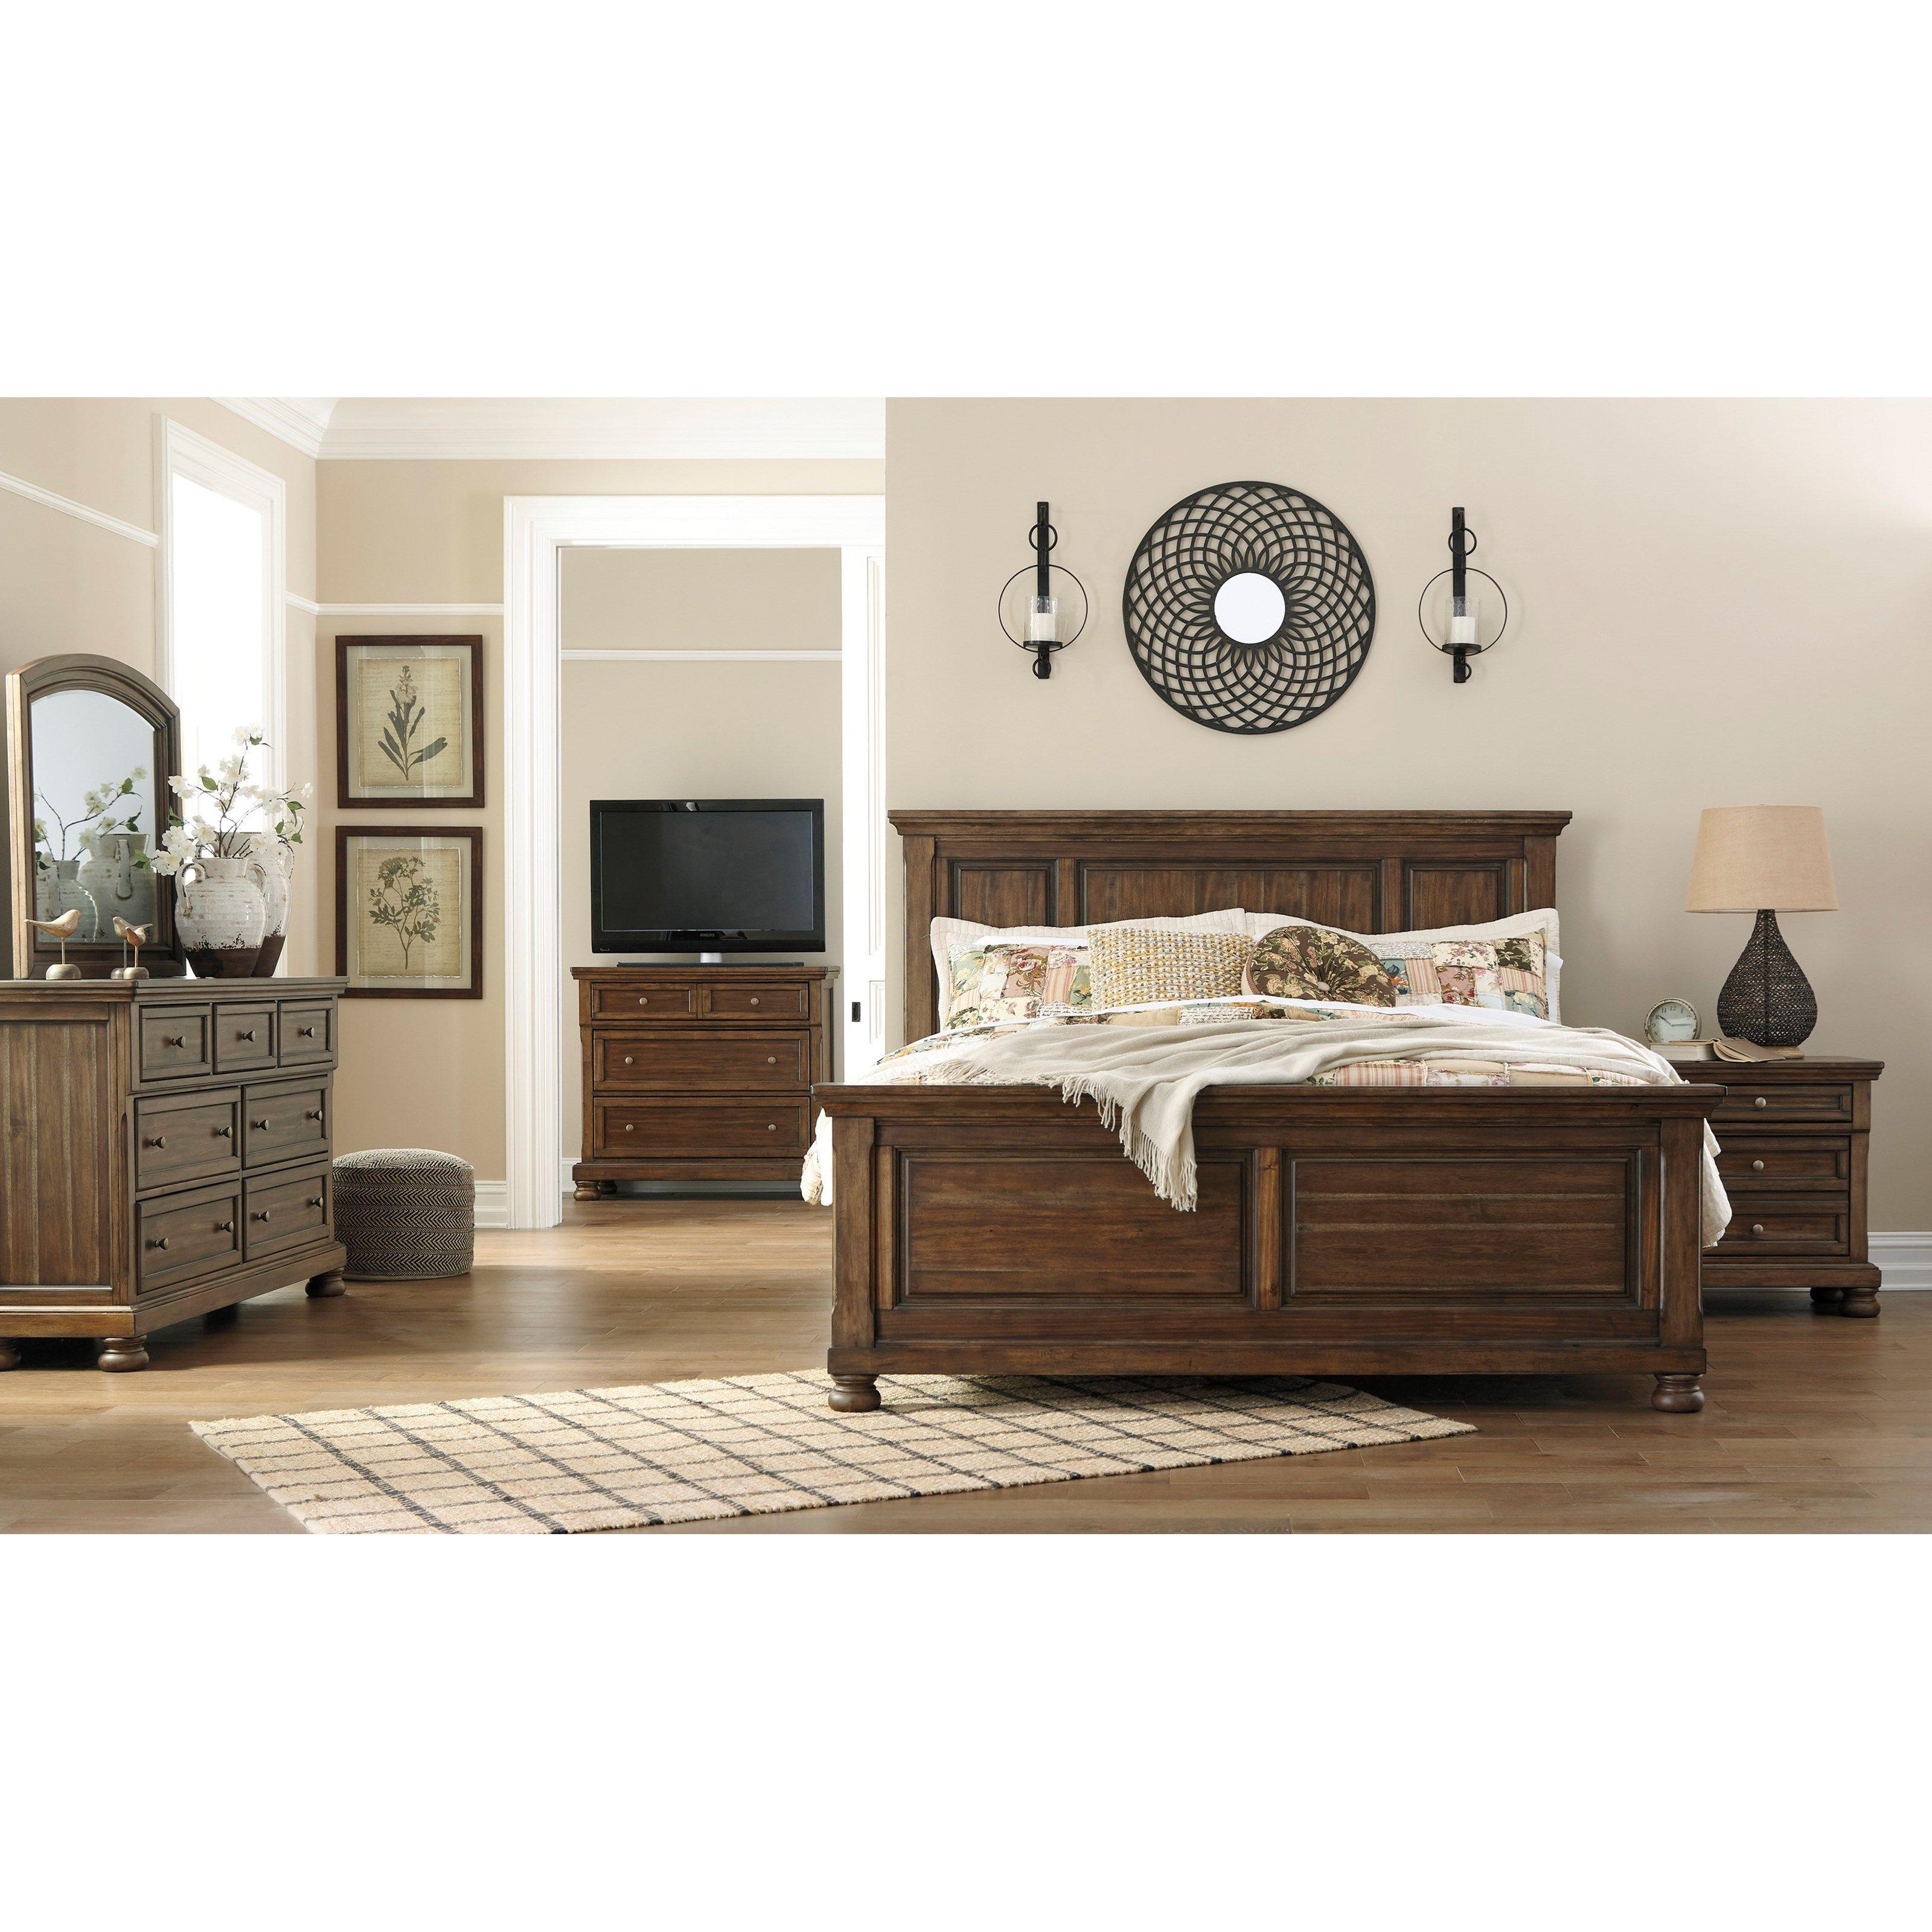 Flynnter Queen Bedroom Group By Signature Design By Ashley At Wayside Furniture Bedroom Sets Bedroom Panel Bedroom Set